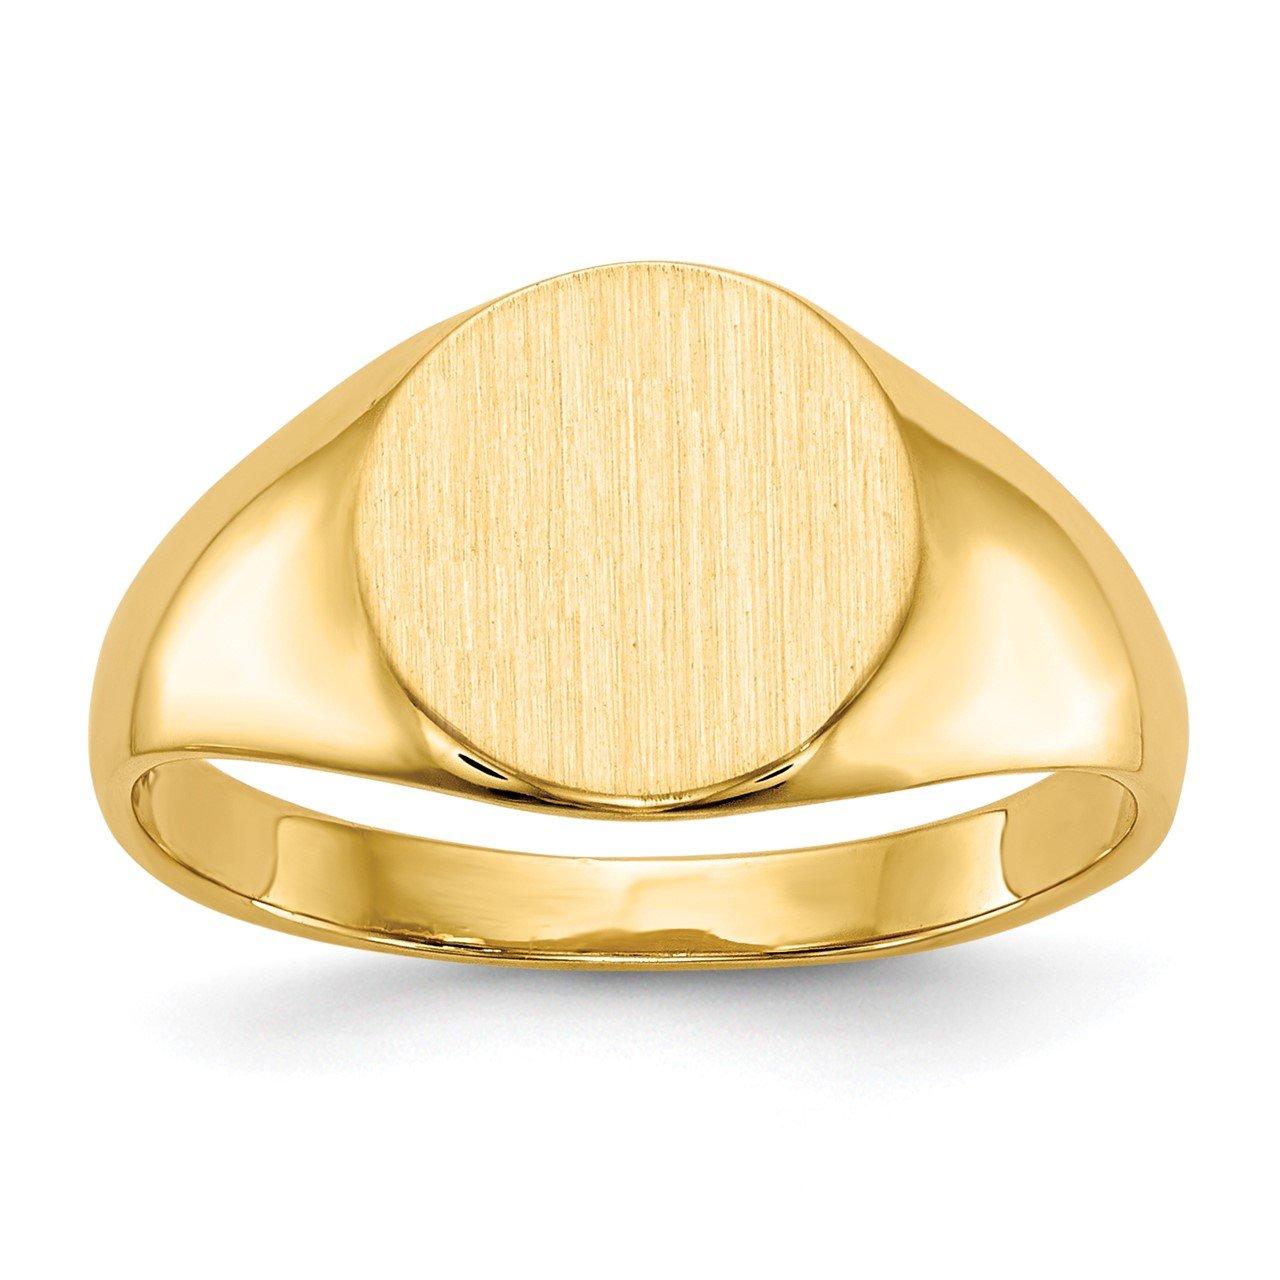 14k 8.5x9.5mm Closed Back Signet Ring